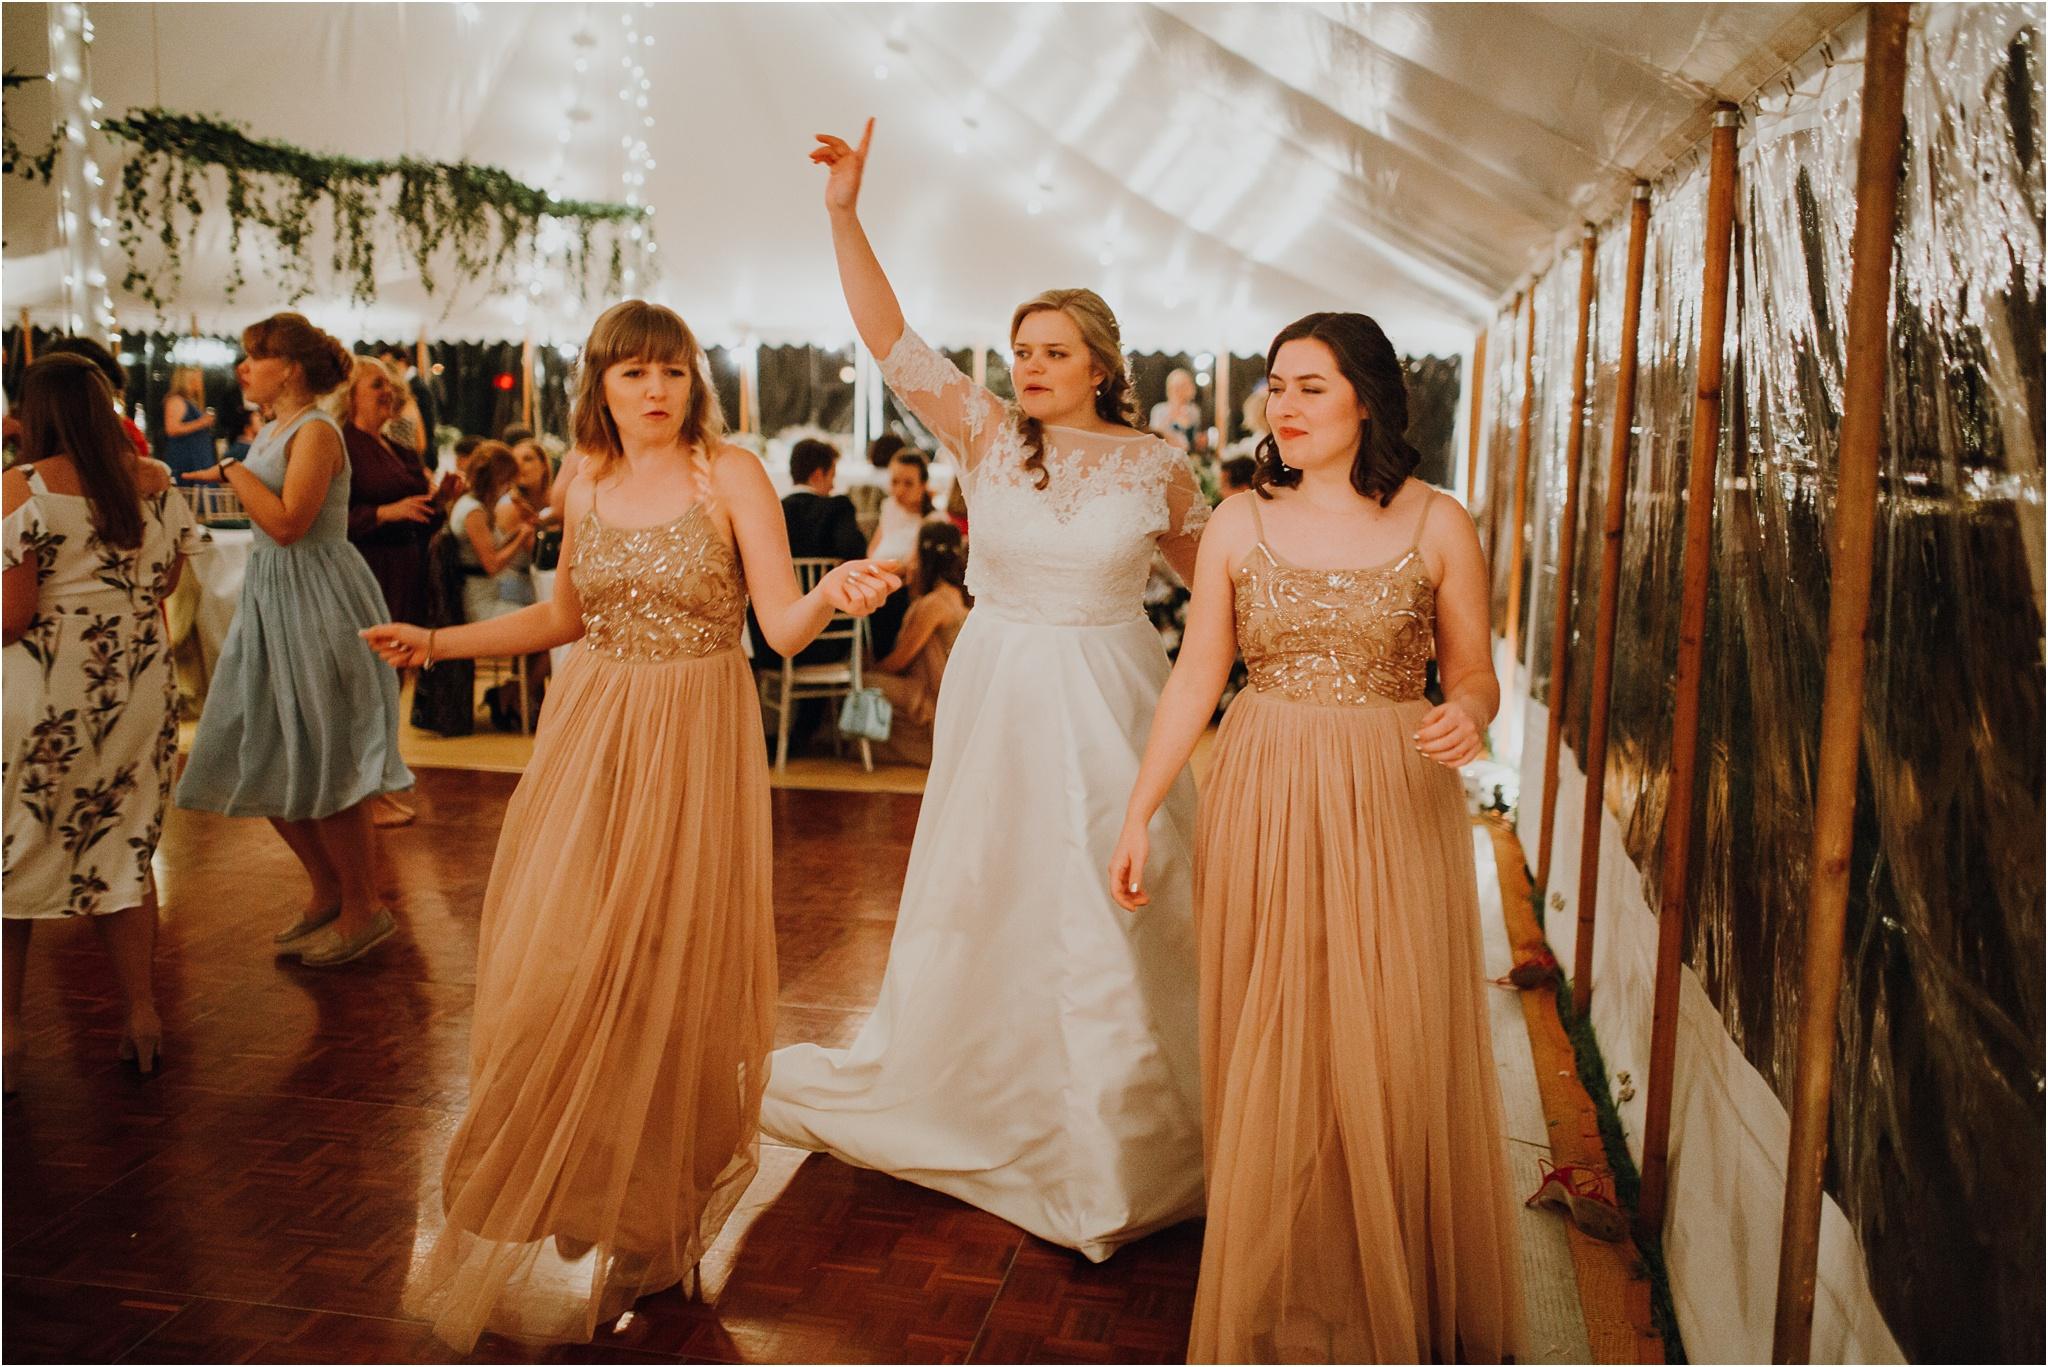 Outdoor-country-wedding-Edinburgh-photographer__0152.jpg